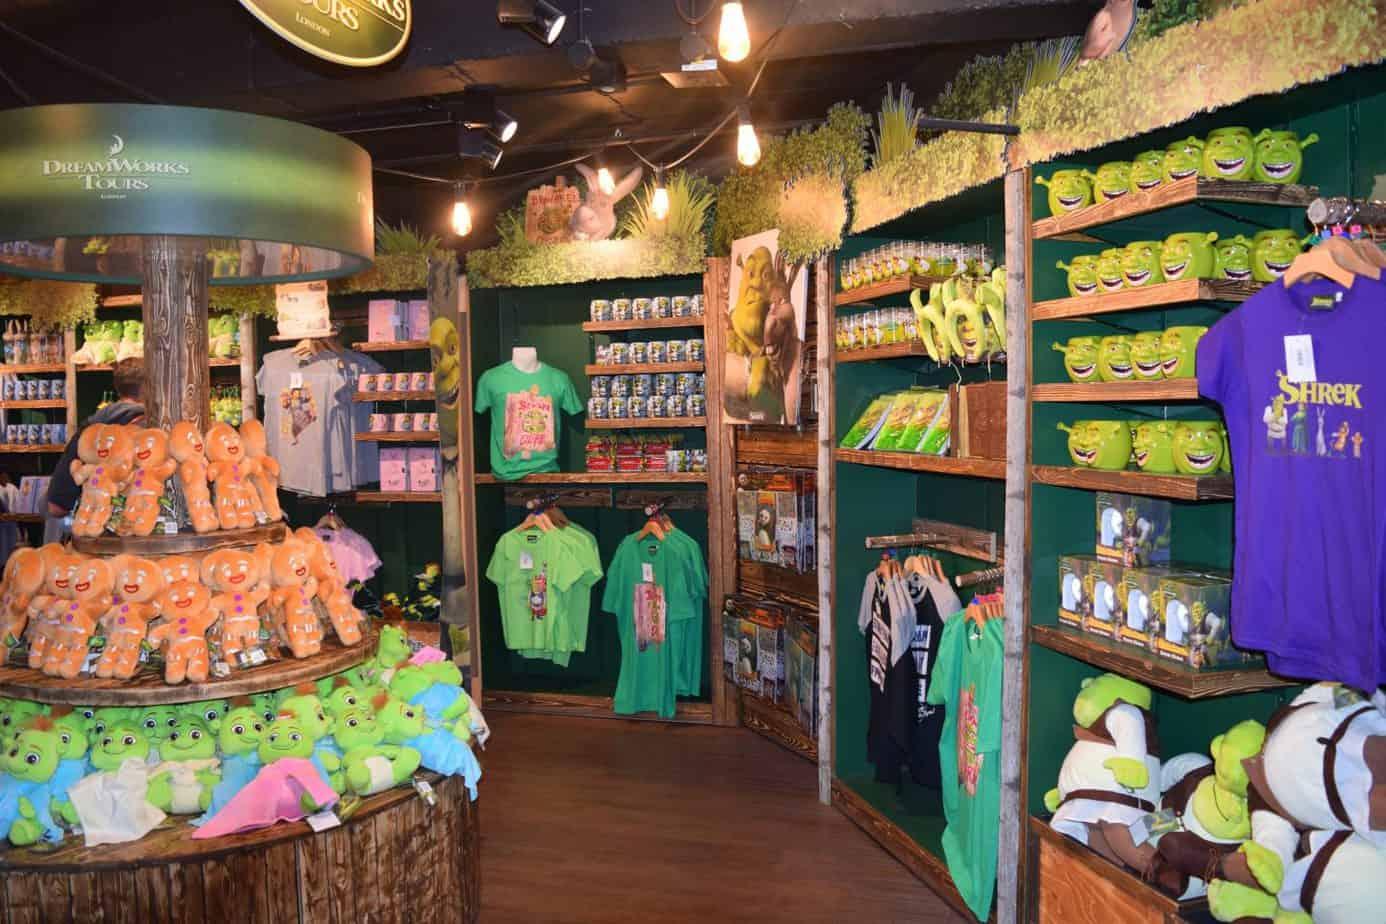 The shop at Shrek's adventure